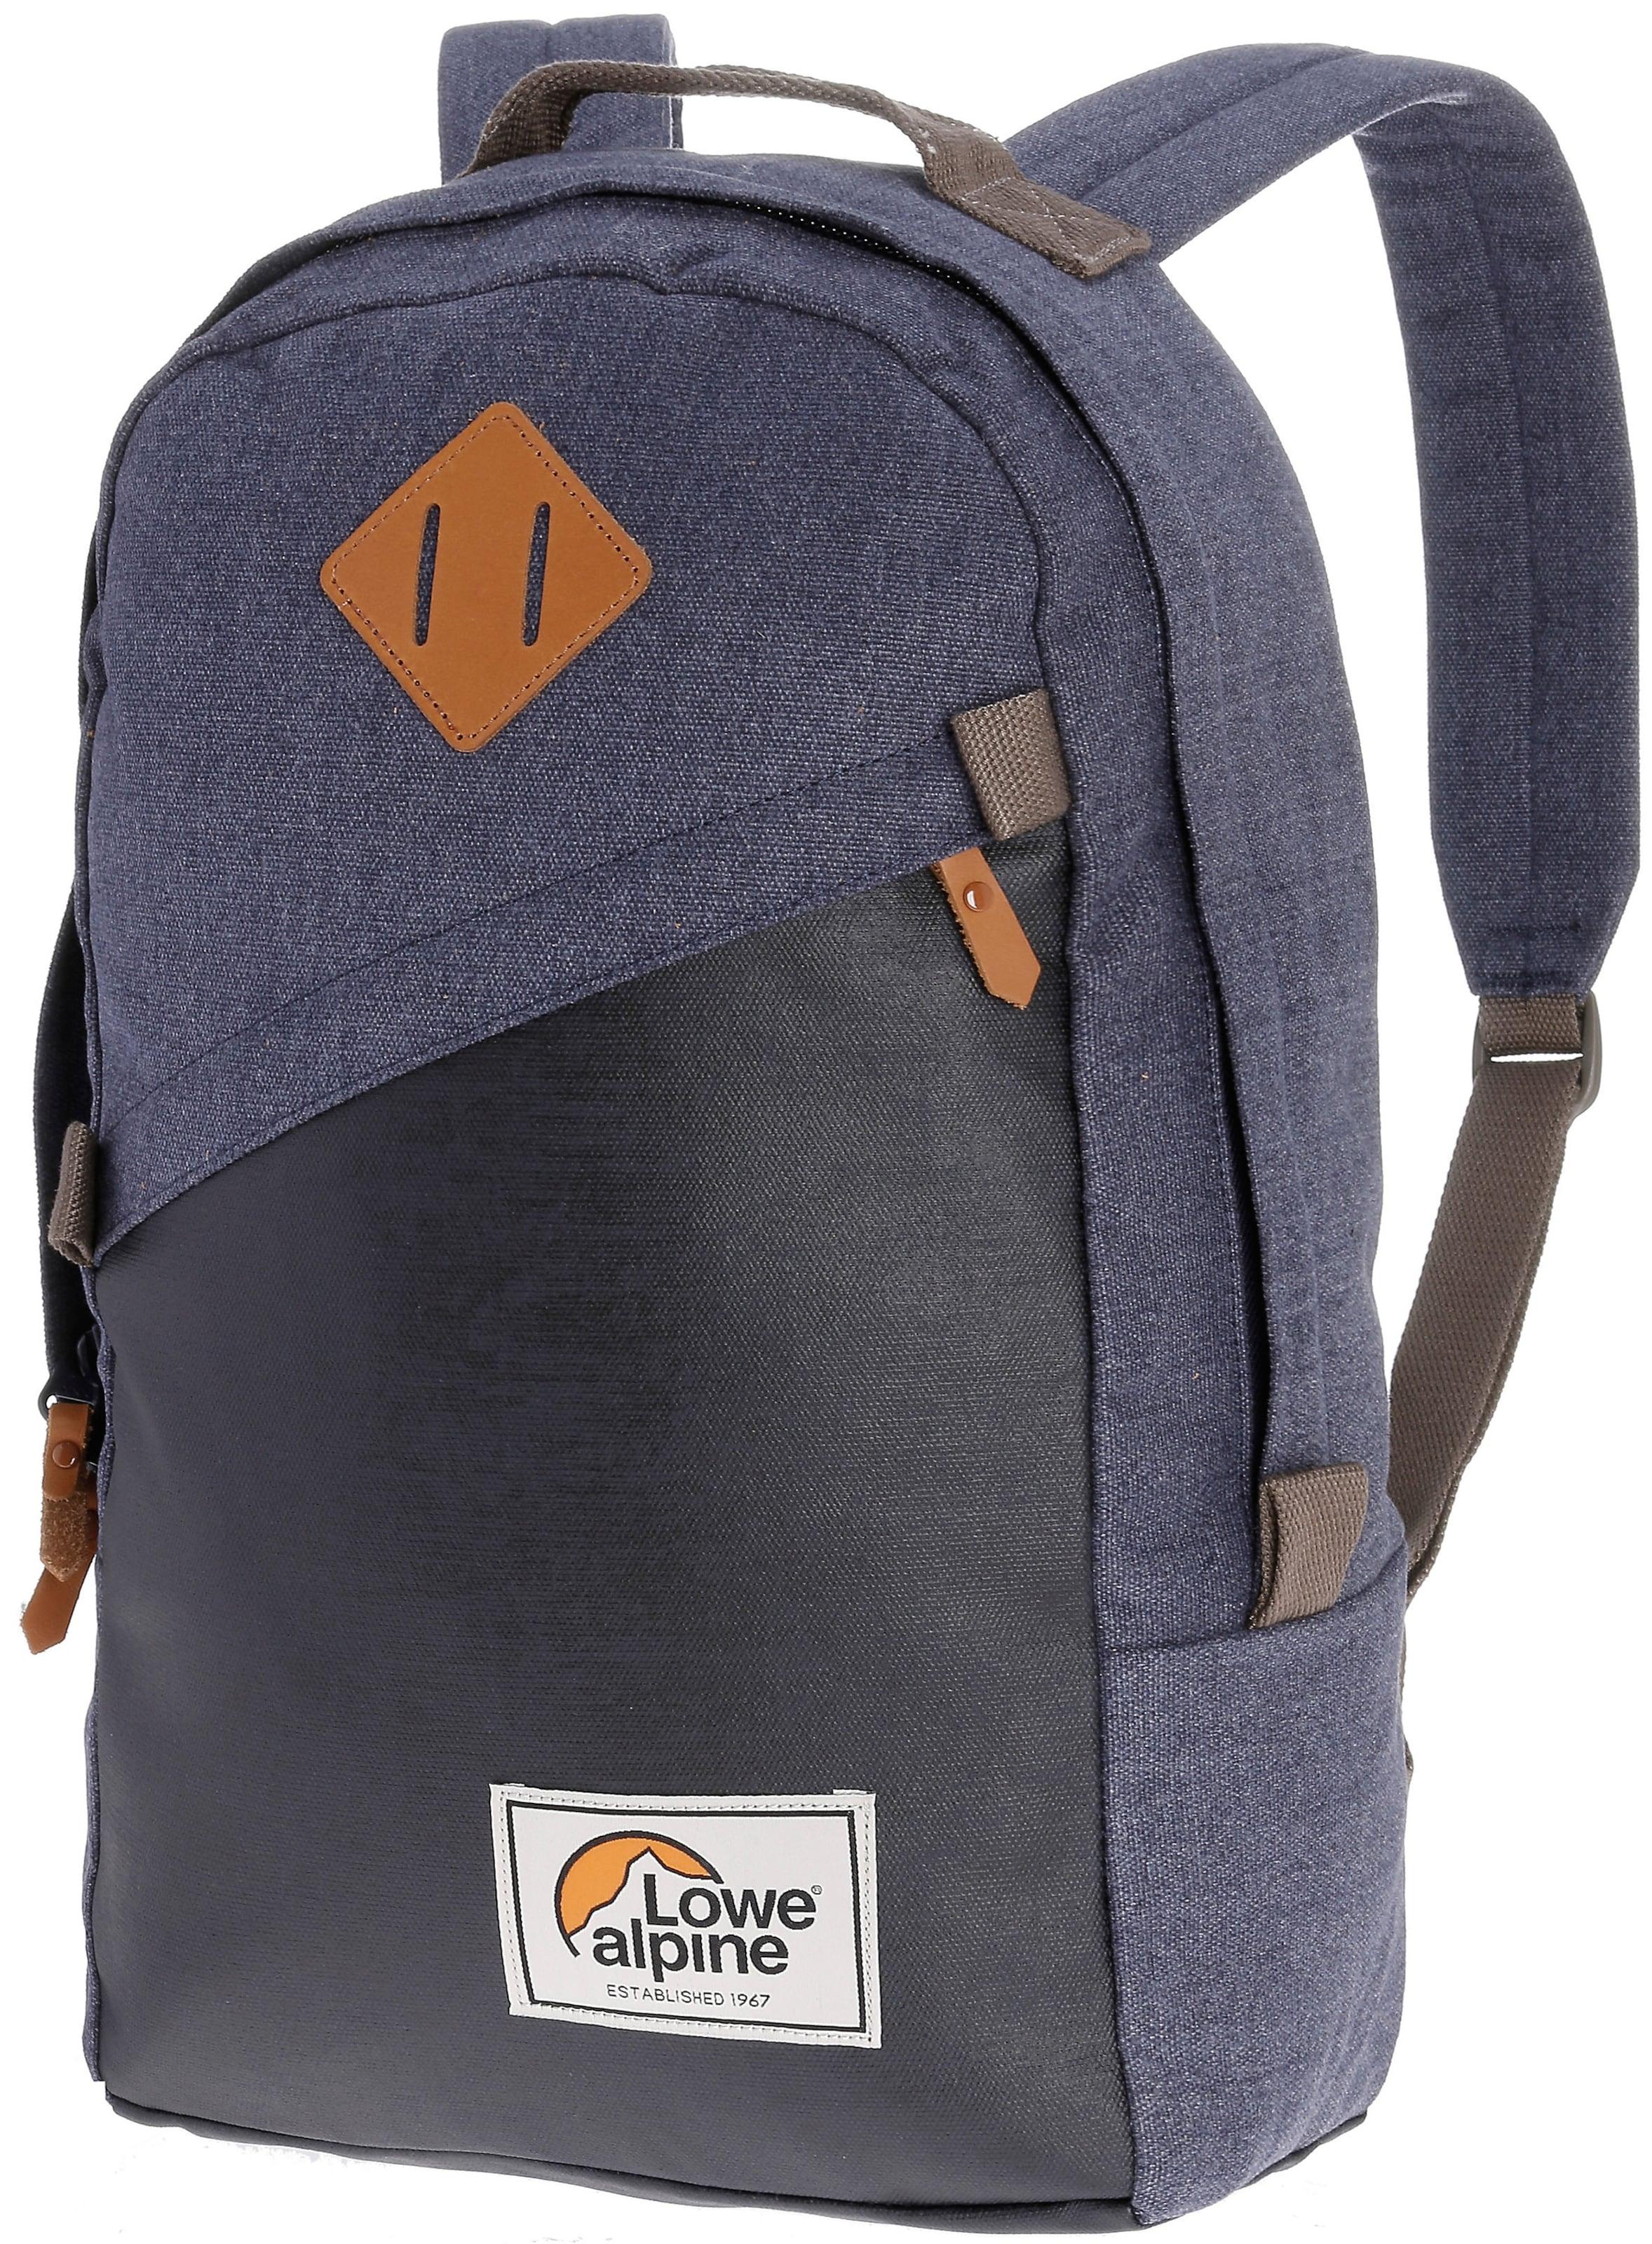 Lowe Daypack Alpine 'adventure' In Violettblau K1JTlFc